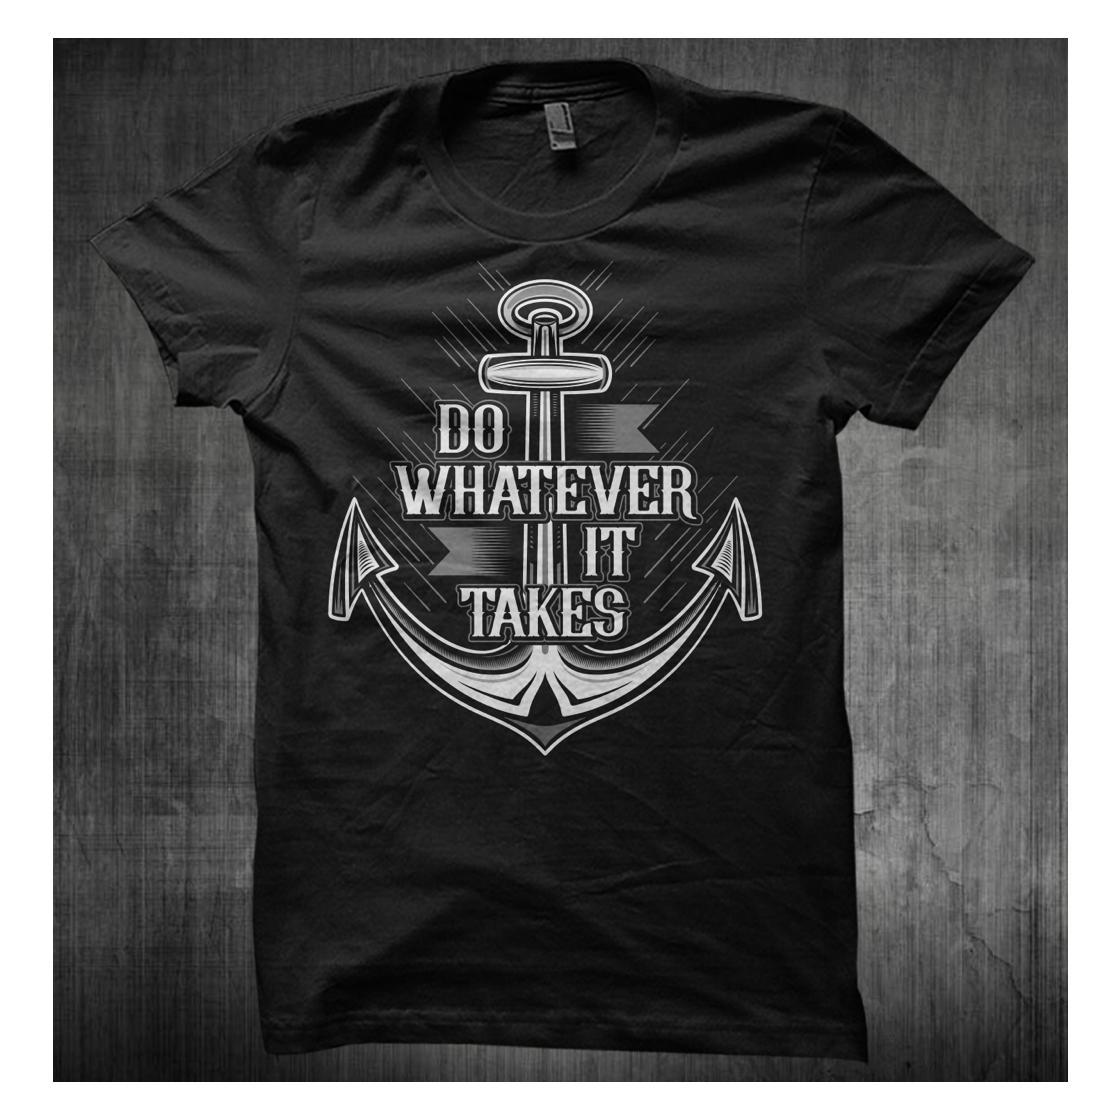 crowdspring t-shirt design by dedonk